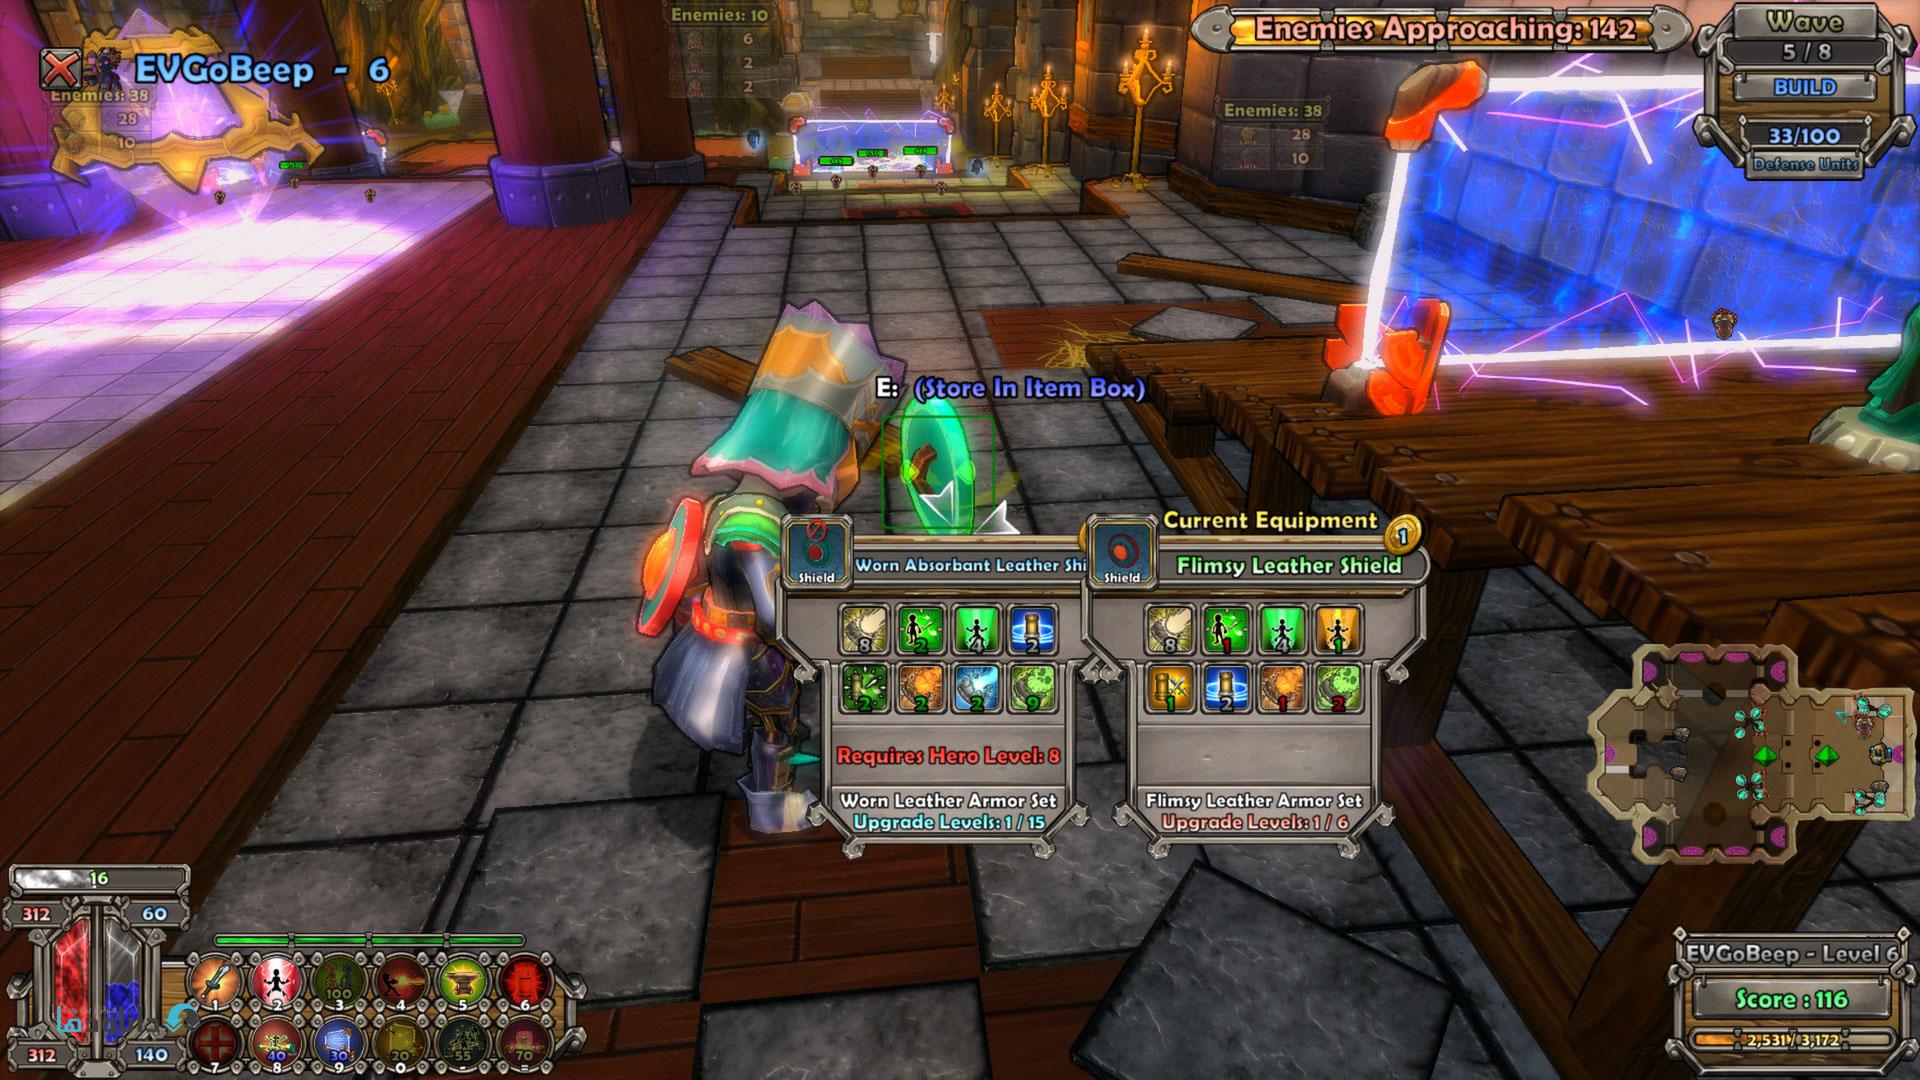 http://img5.downloadha.com/hosein/Game/April%202015/07/Dungeon-Defenders-Eternity-screenshots-06-large.jpg